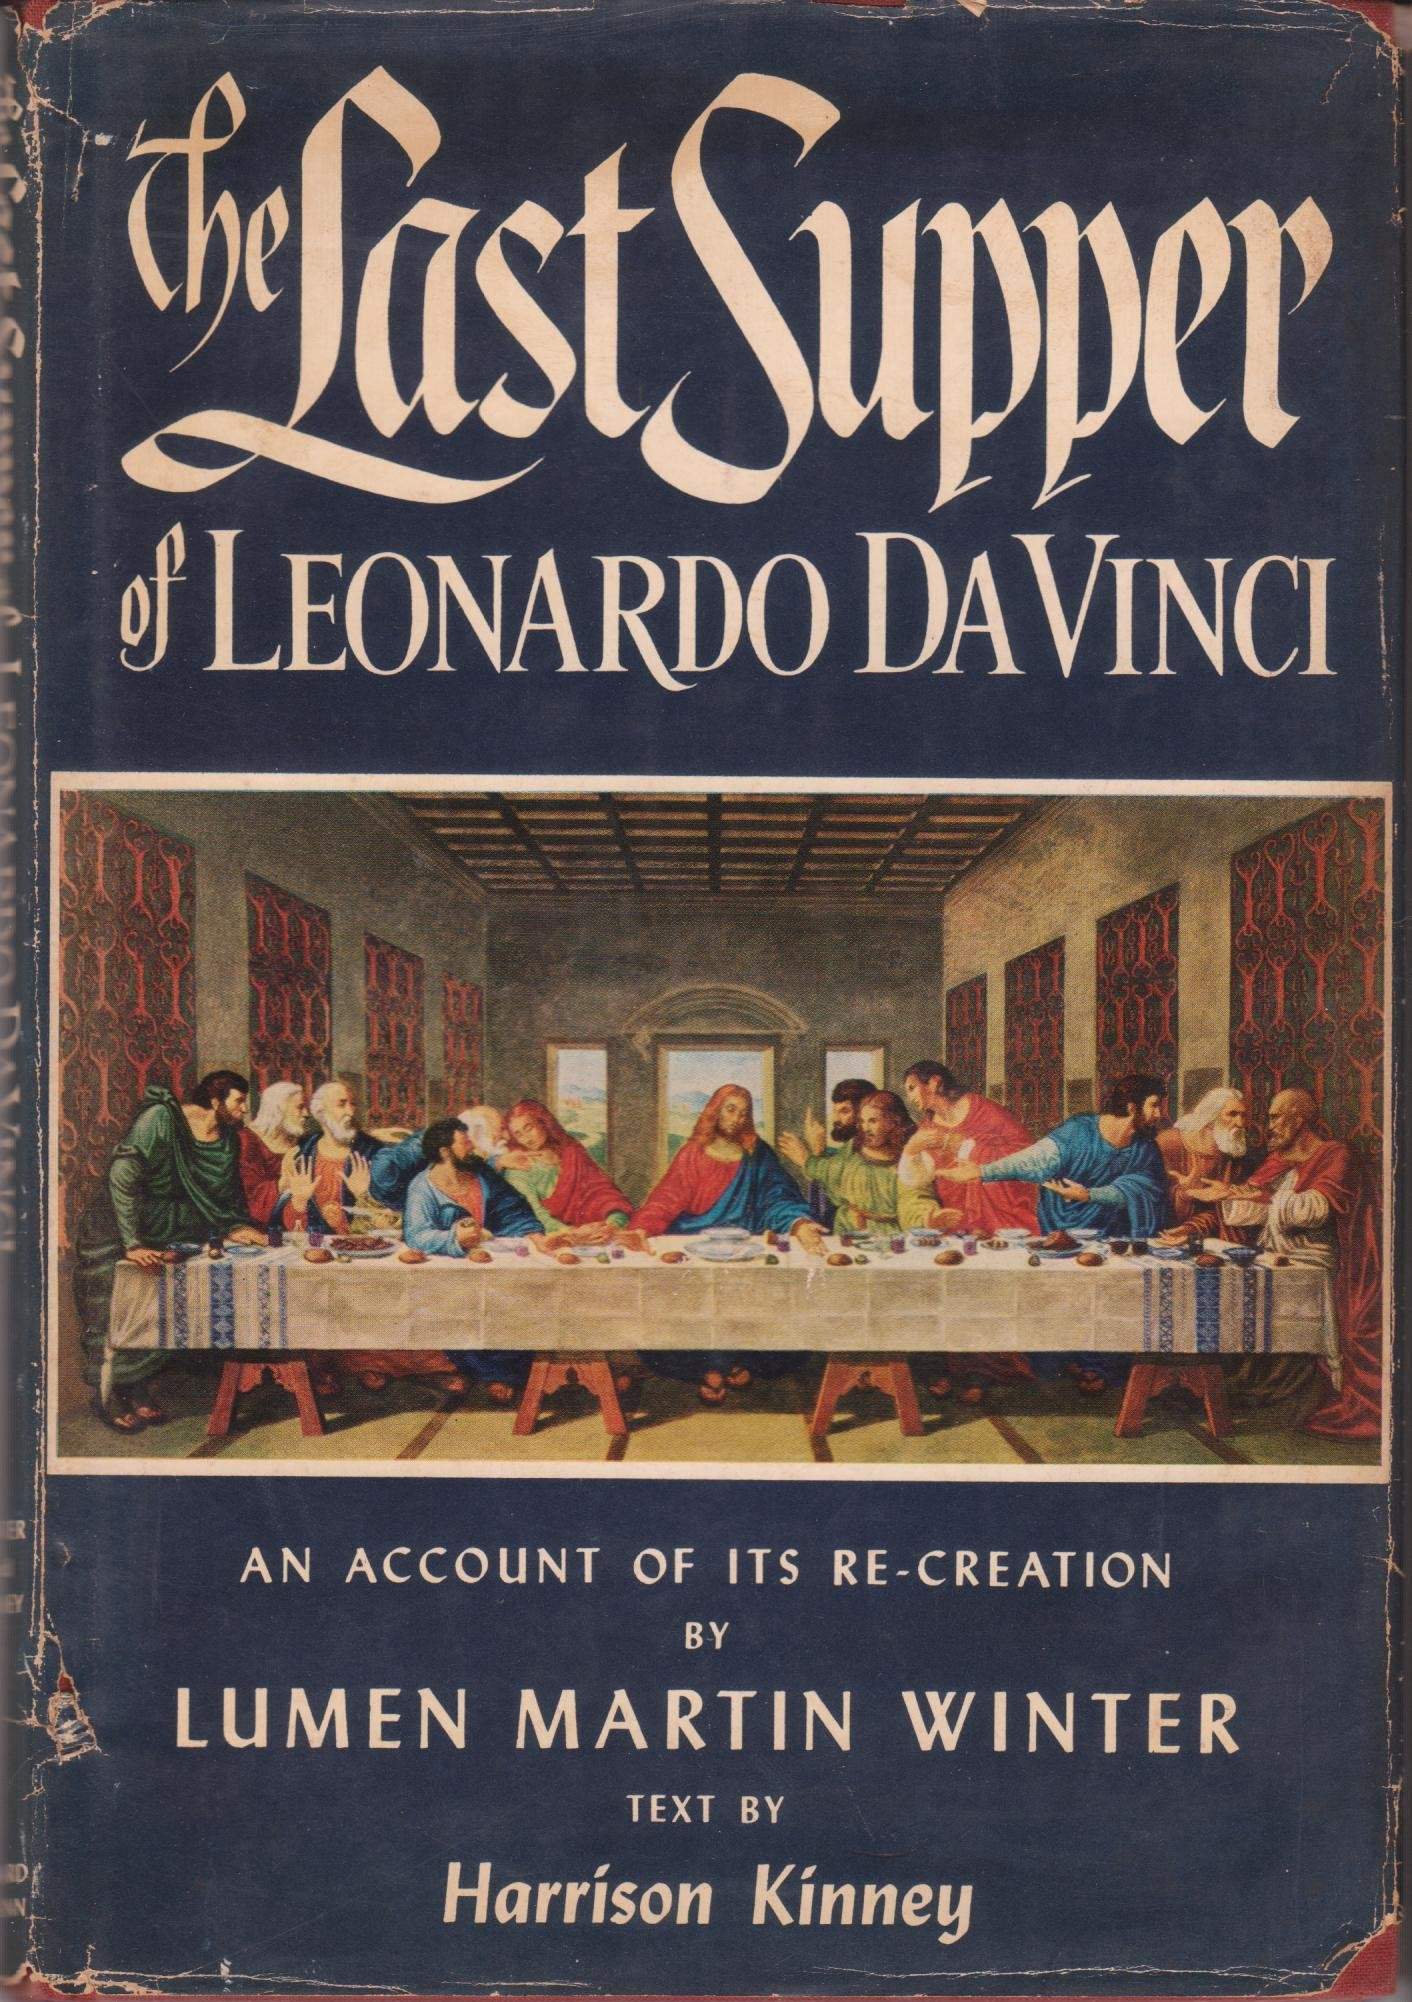 the last supper of leonardo da vinci an account of its re creation by lumen martin winter